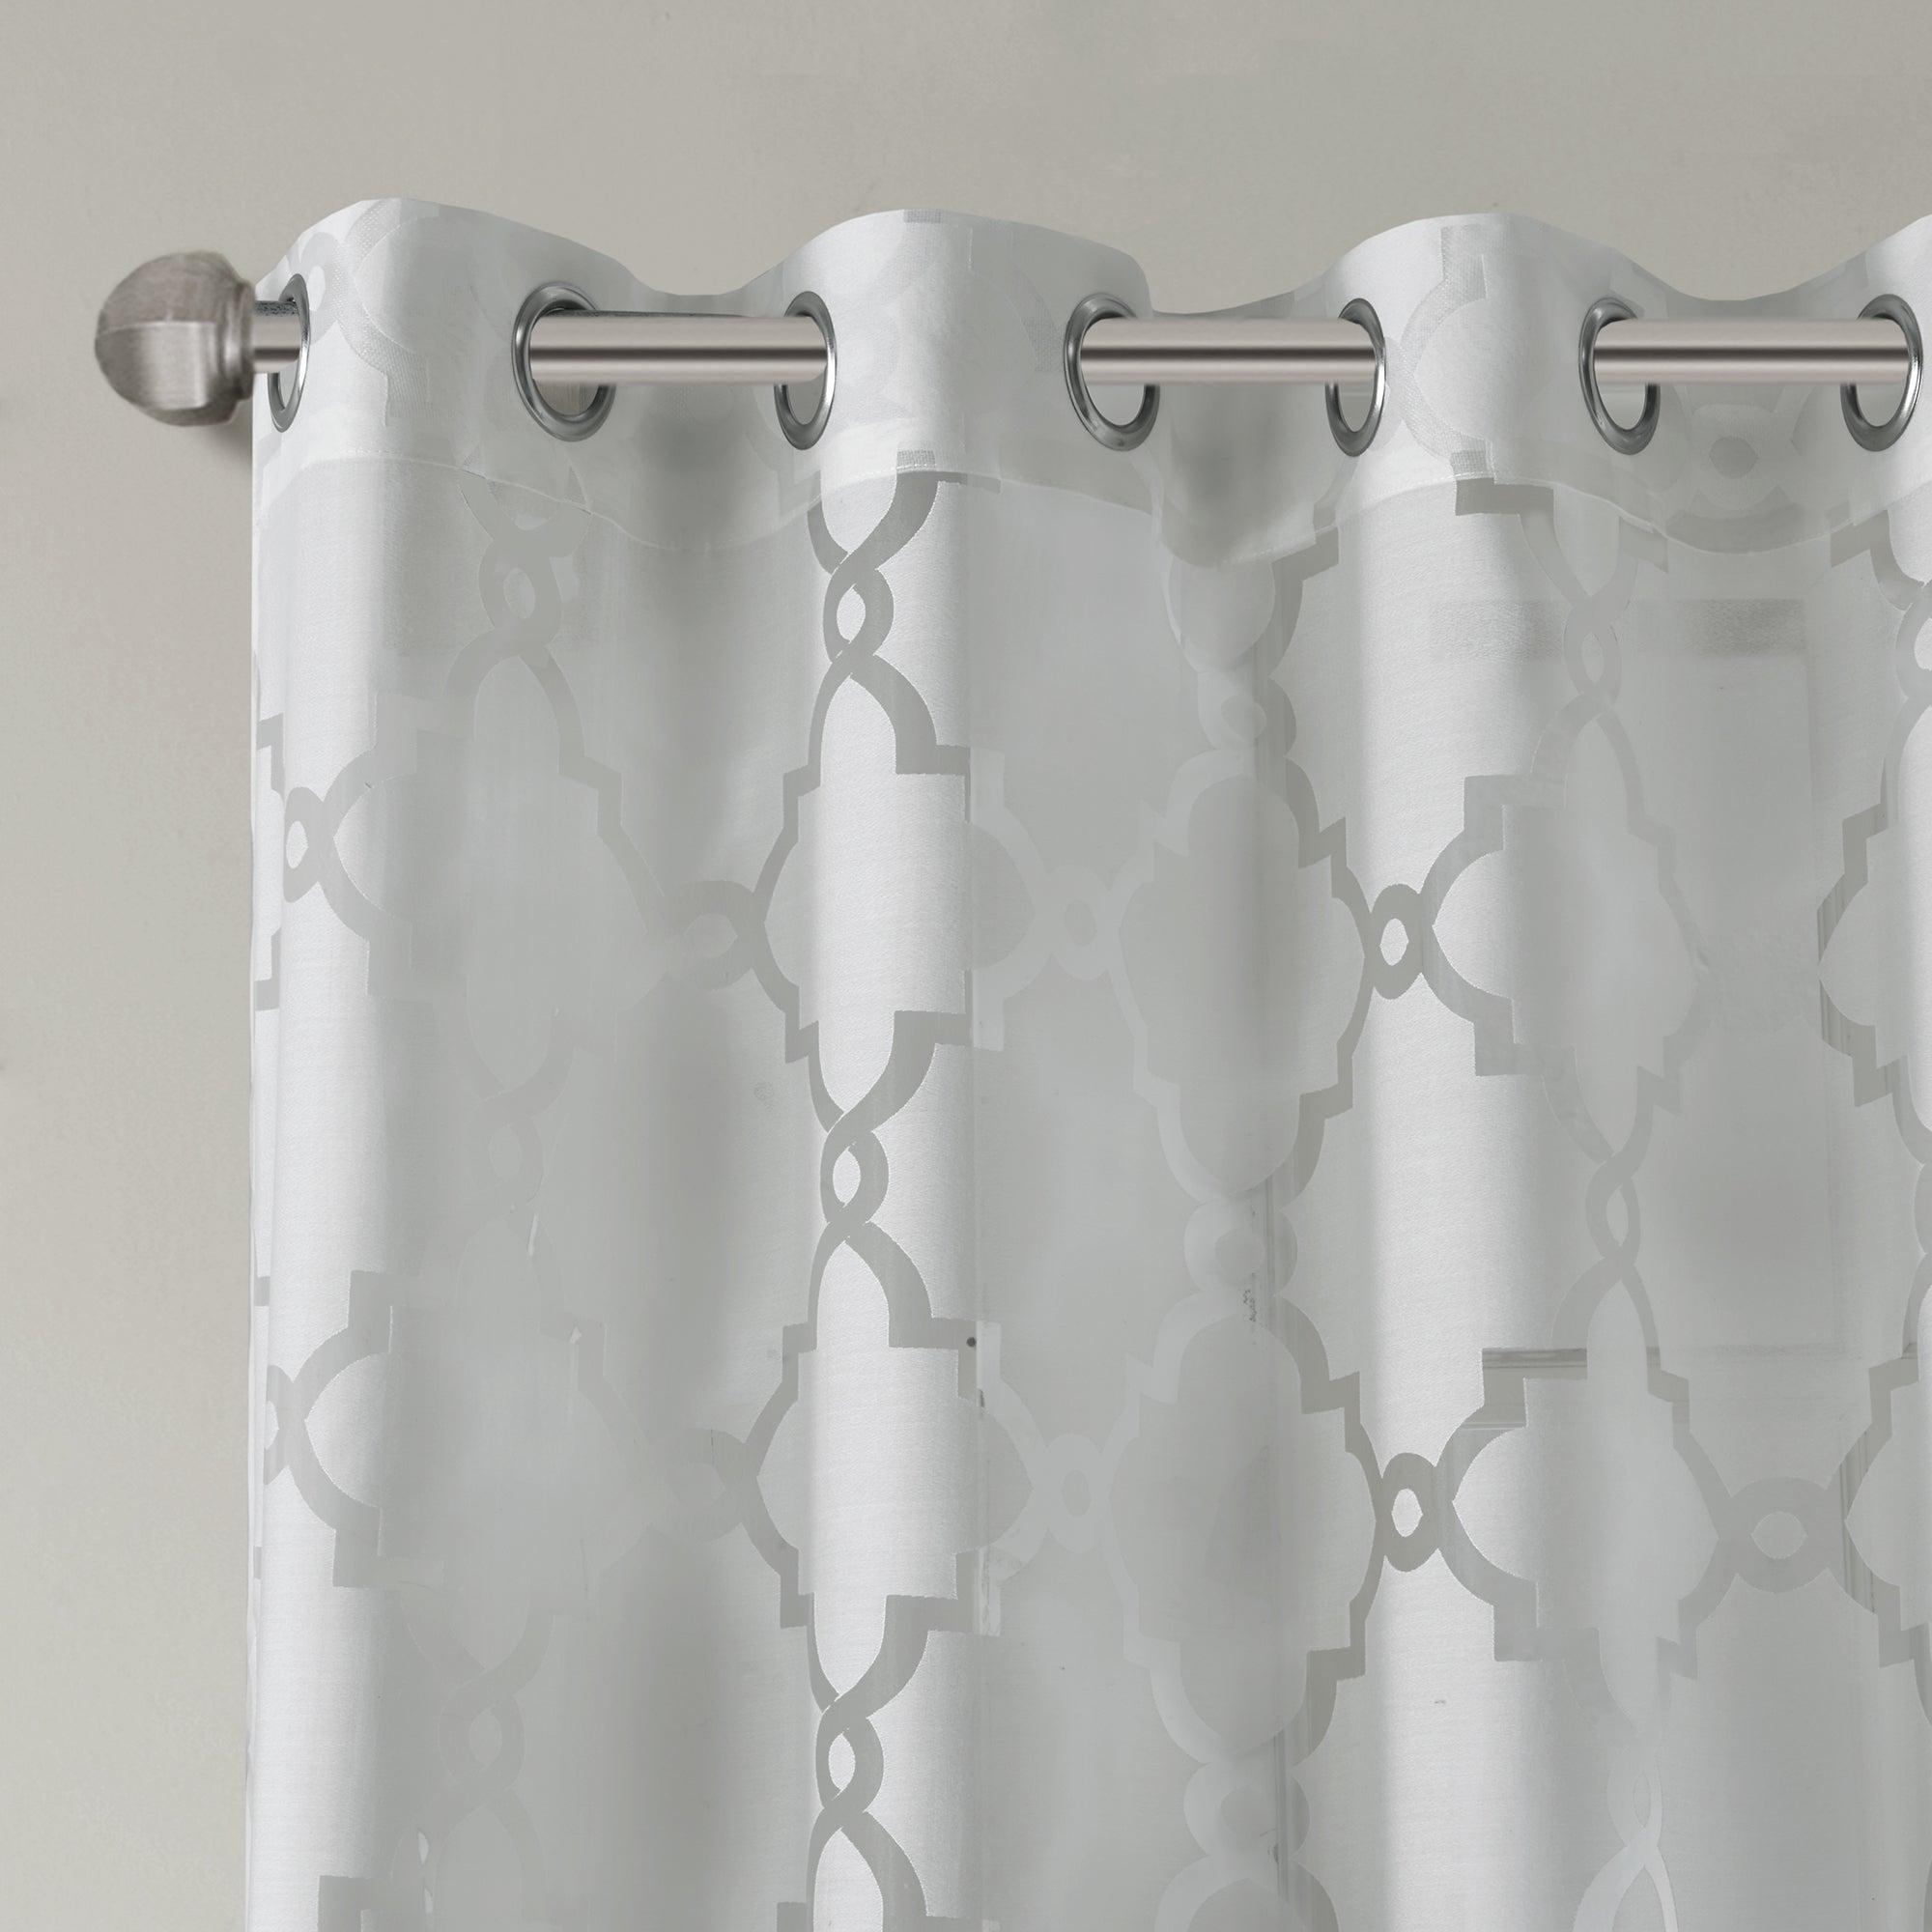 Madison Park Laya Fretwork Burnout Sheer Curtain Panel Pertaining To Laya Fretwork Burnout Sheer Curtain Panels (View 5 of 20)